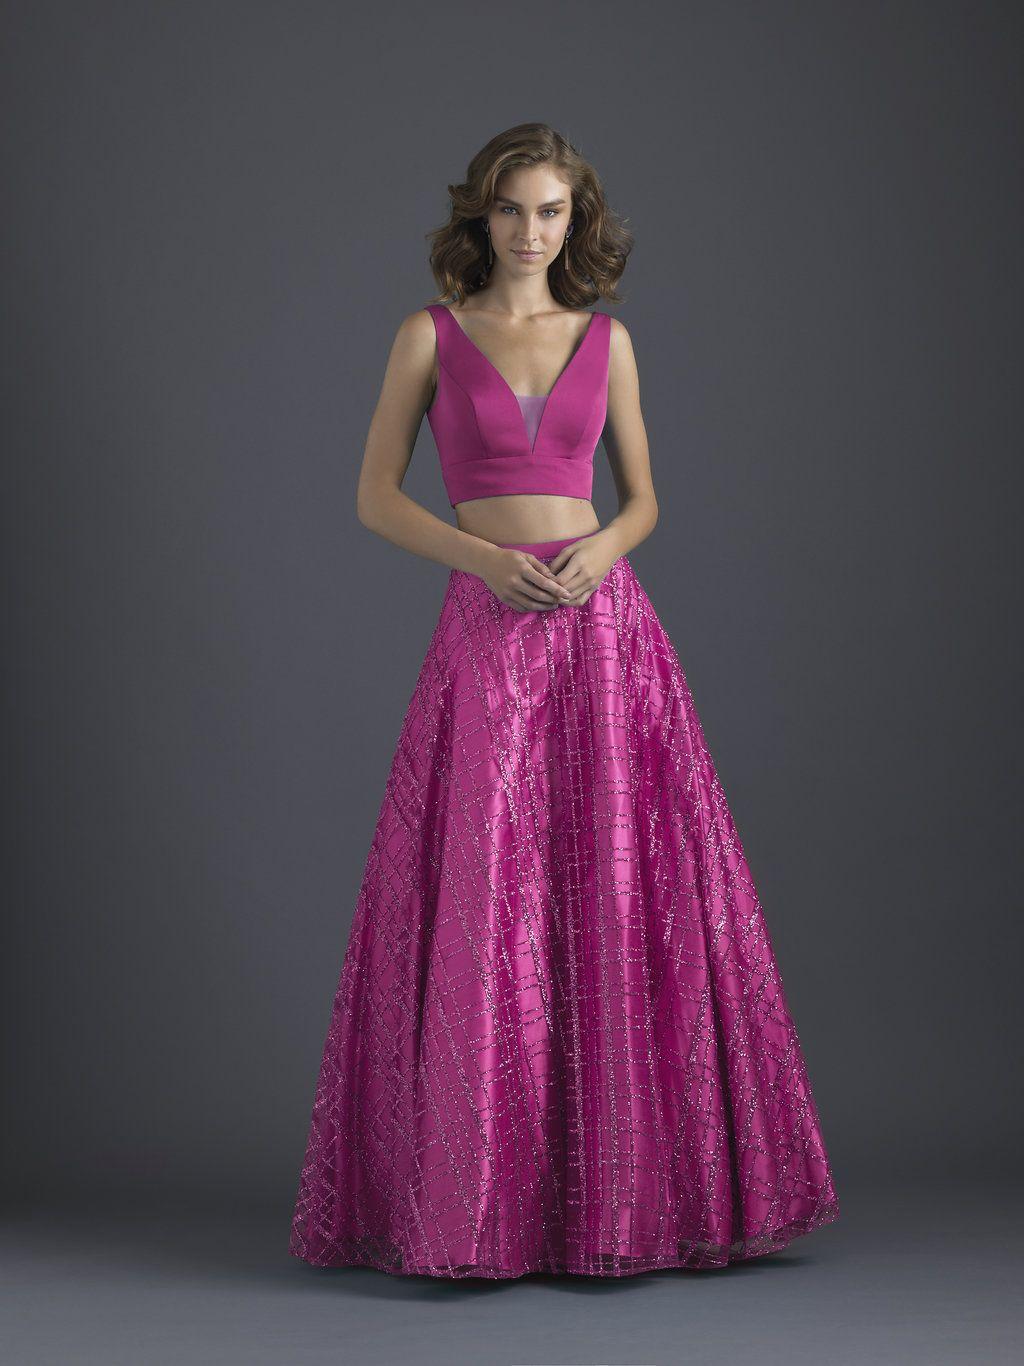 Pin on Evening Dress